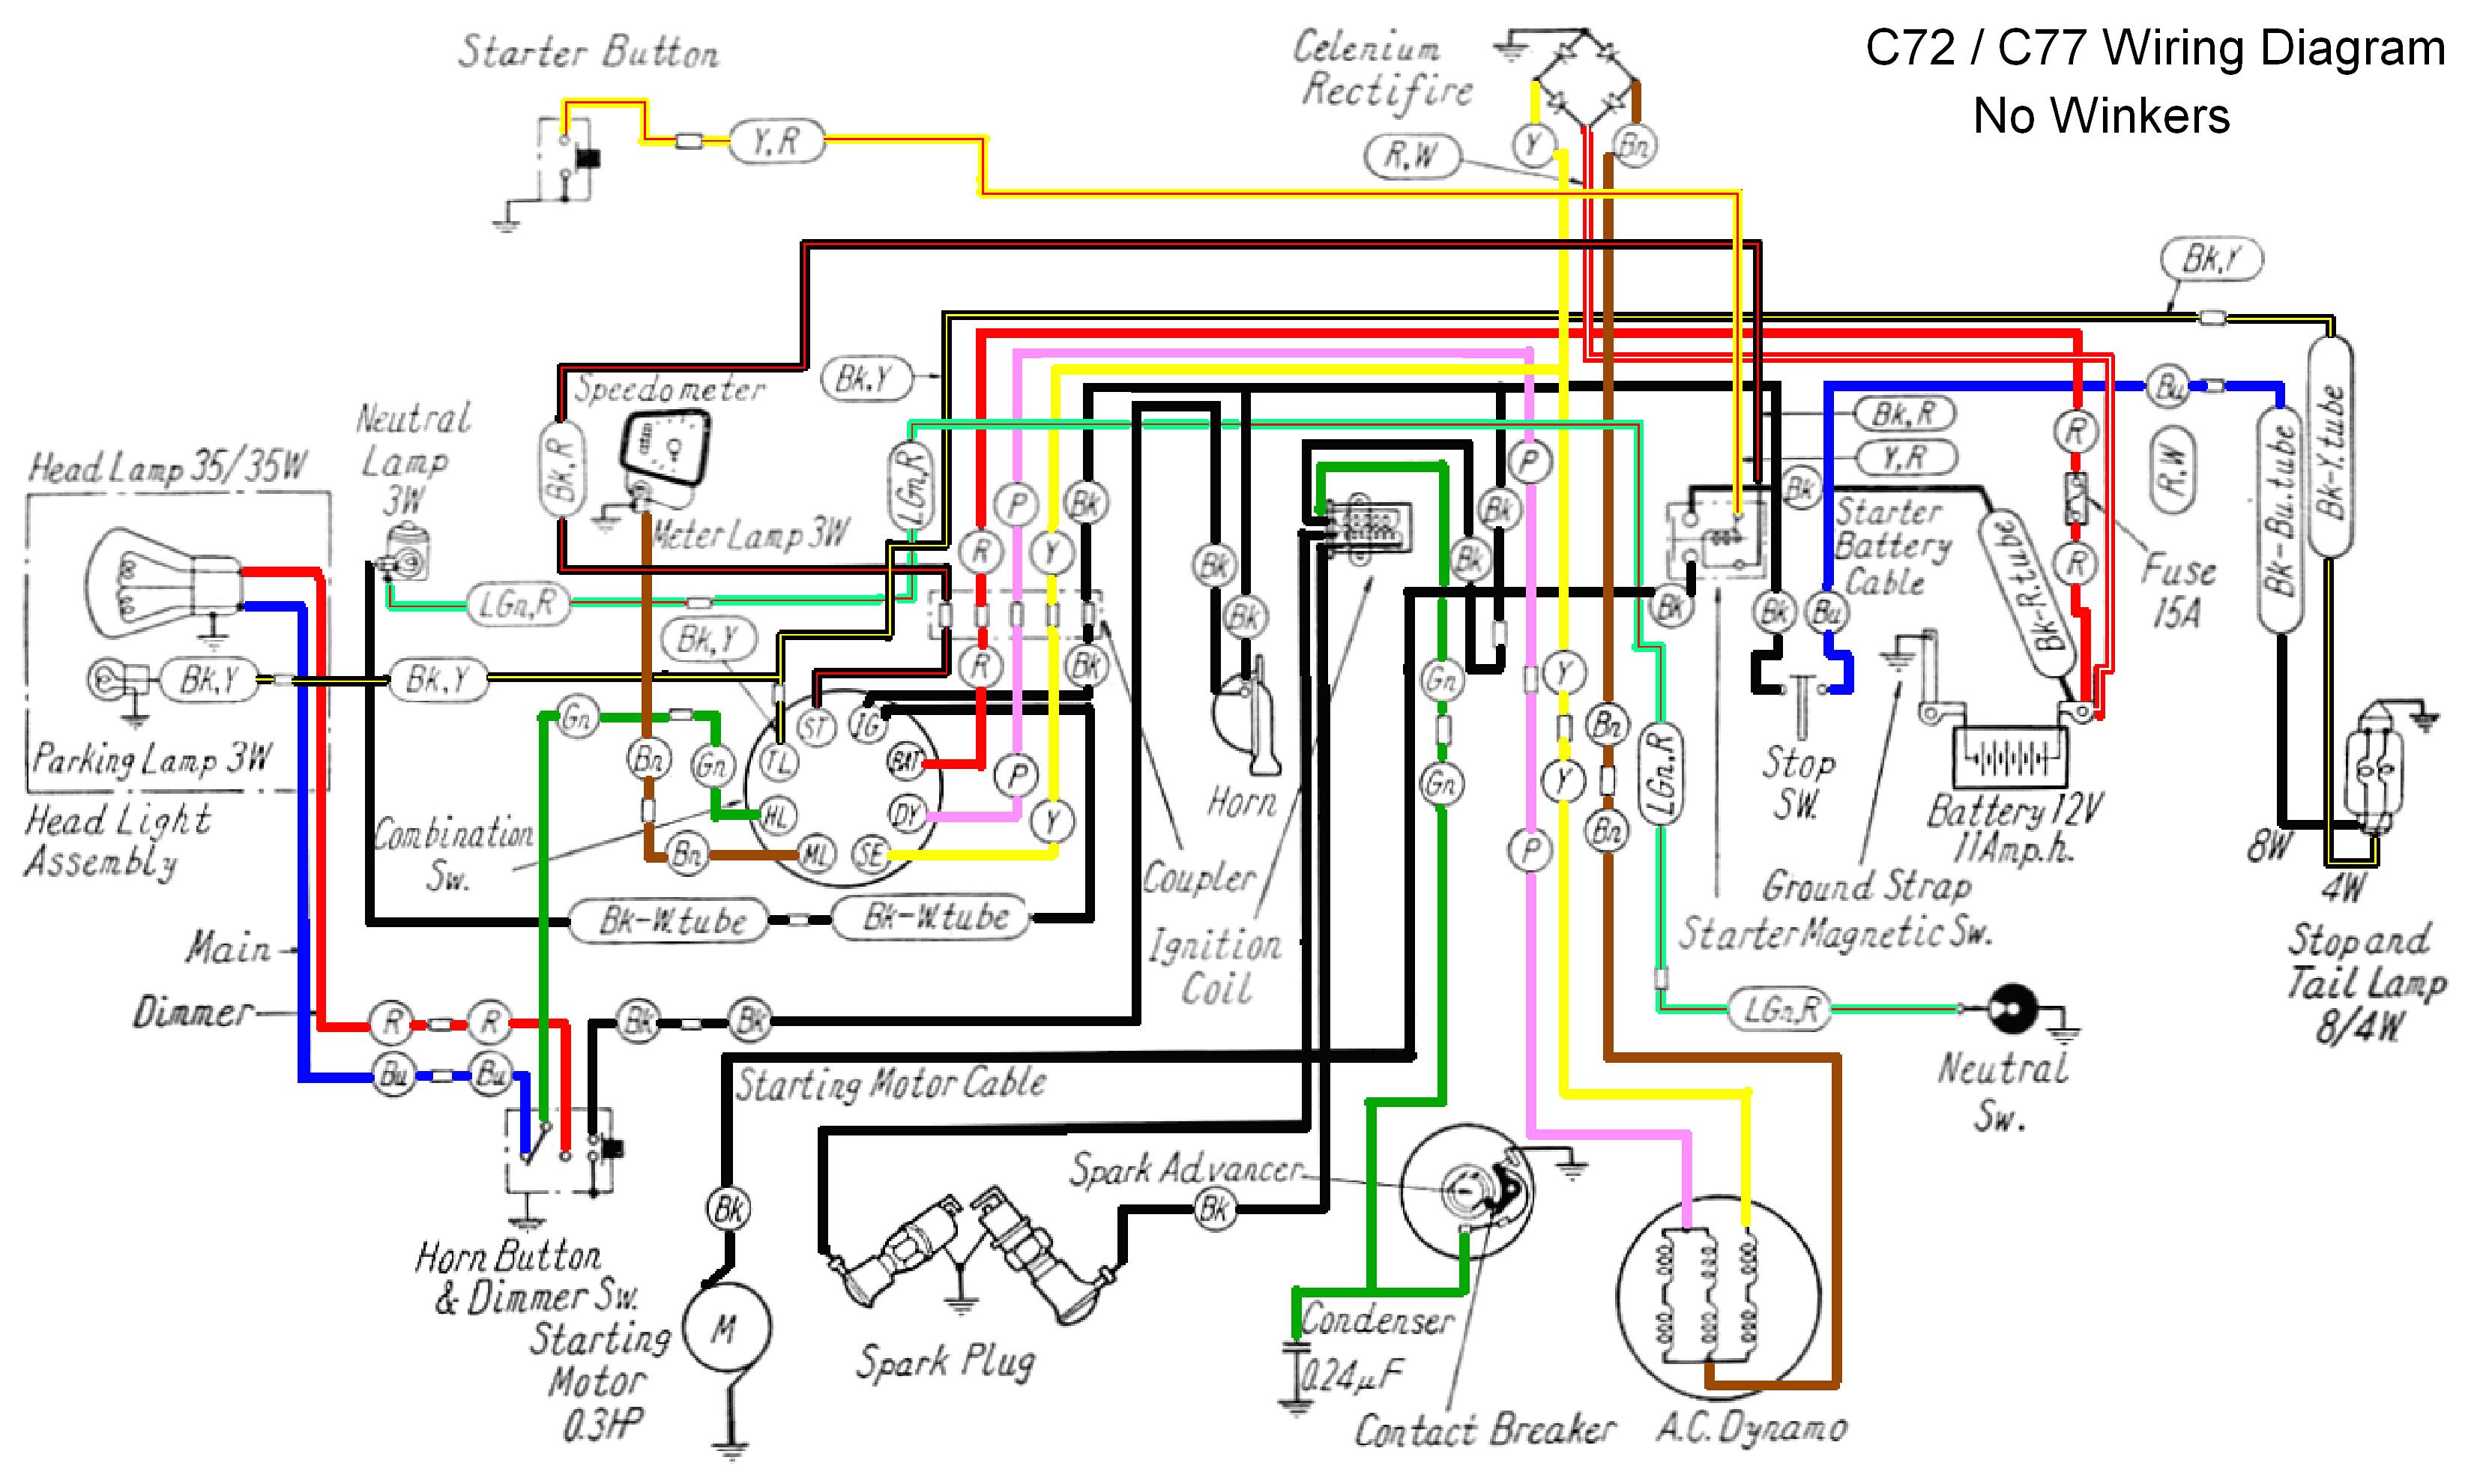 honda 110 wiring diagram wiring diagram expert honda xrm 110 wiring diagram download honda 110 wiring